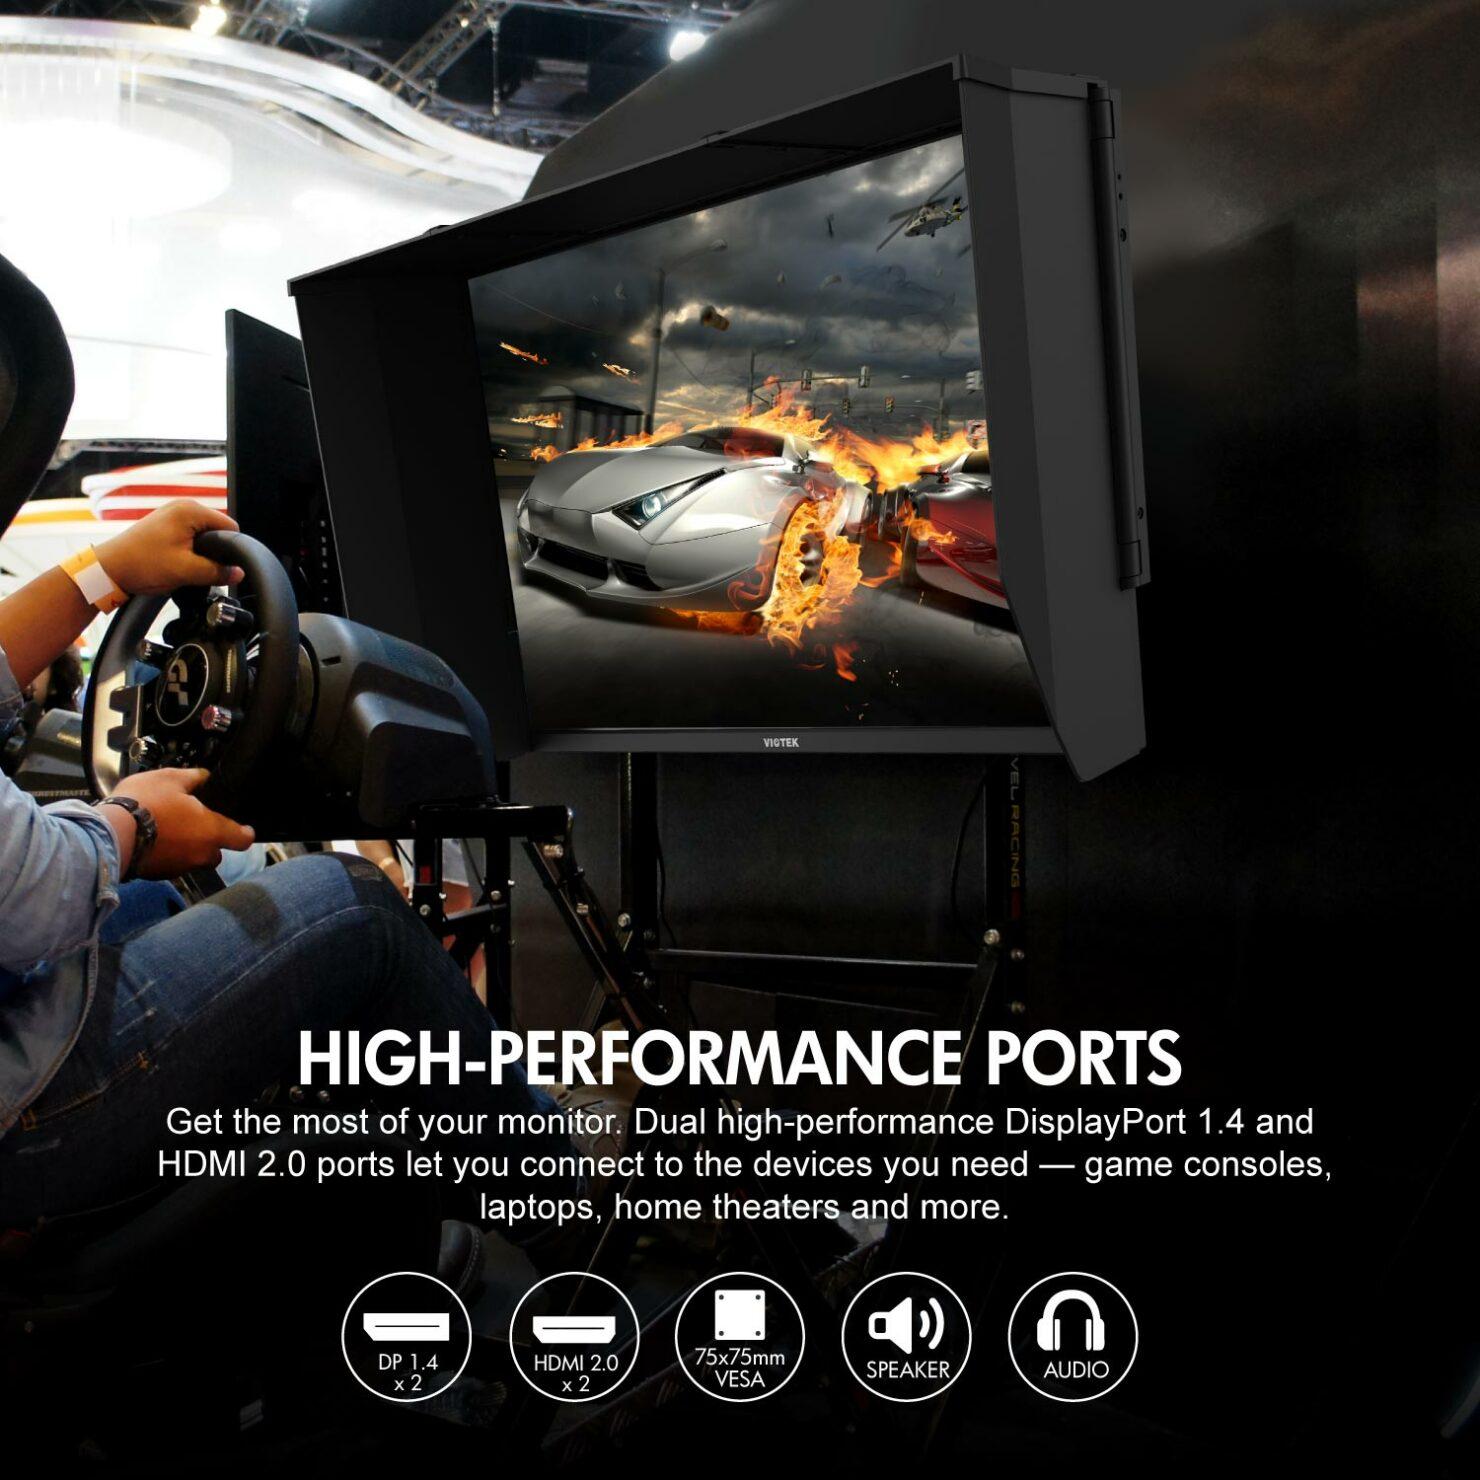 gfi27qxa-27in-4k-1ms-144hz-gaming-monitor-high-performance-ports